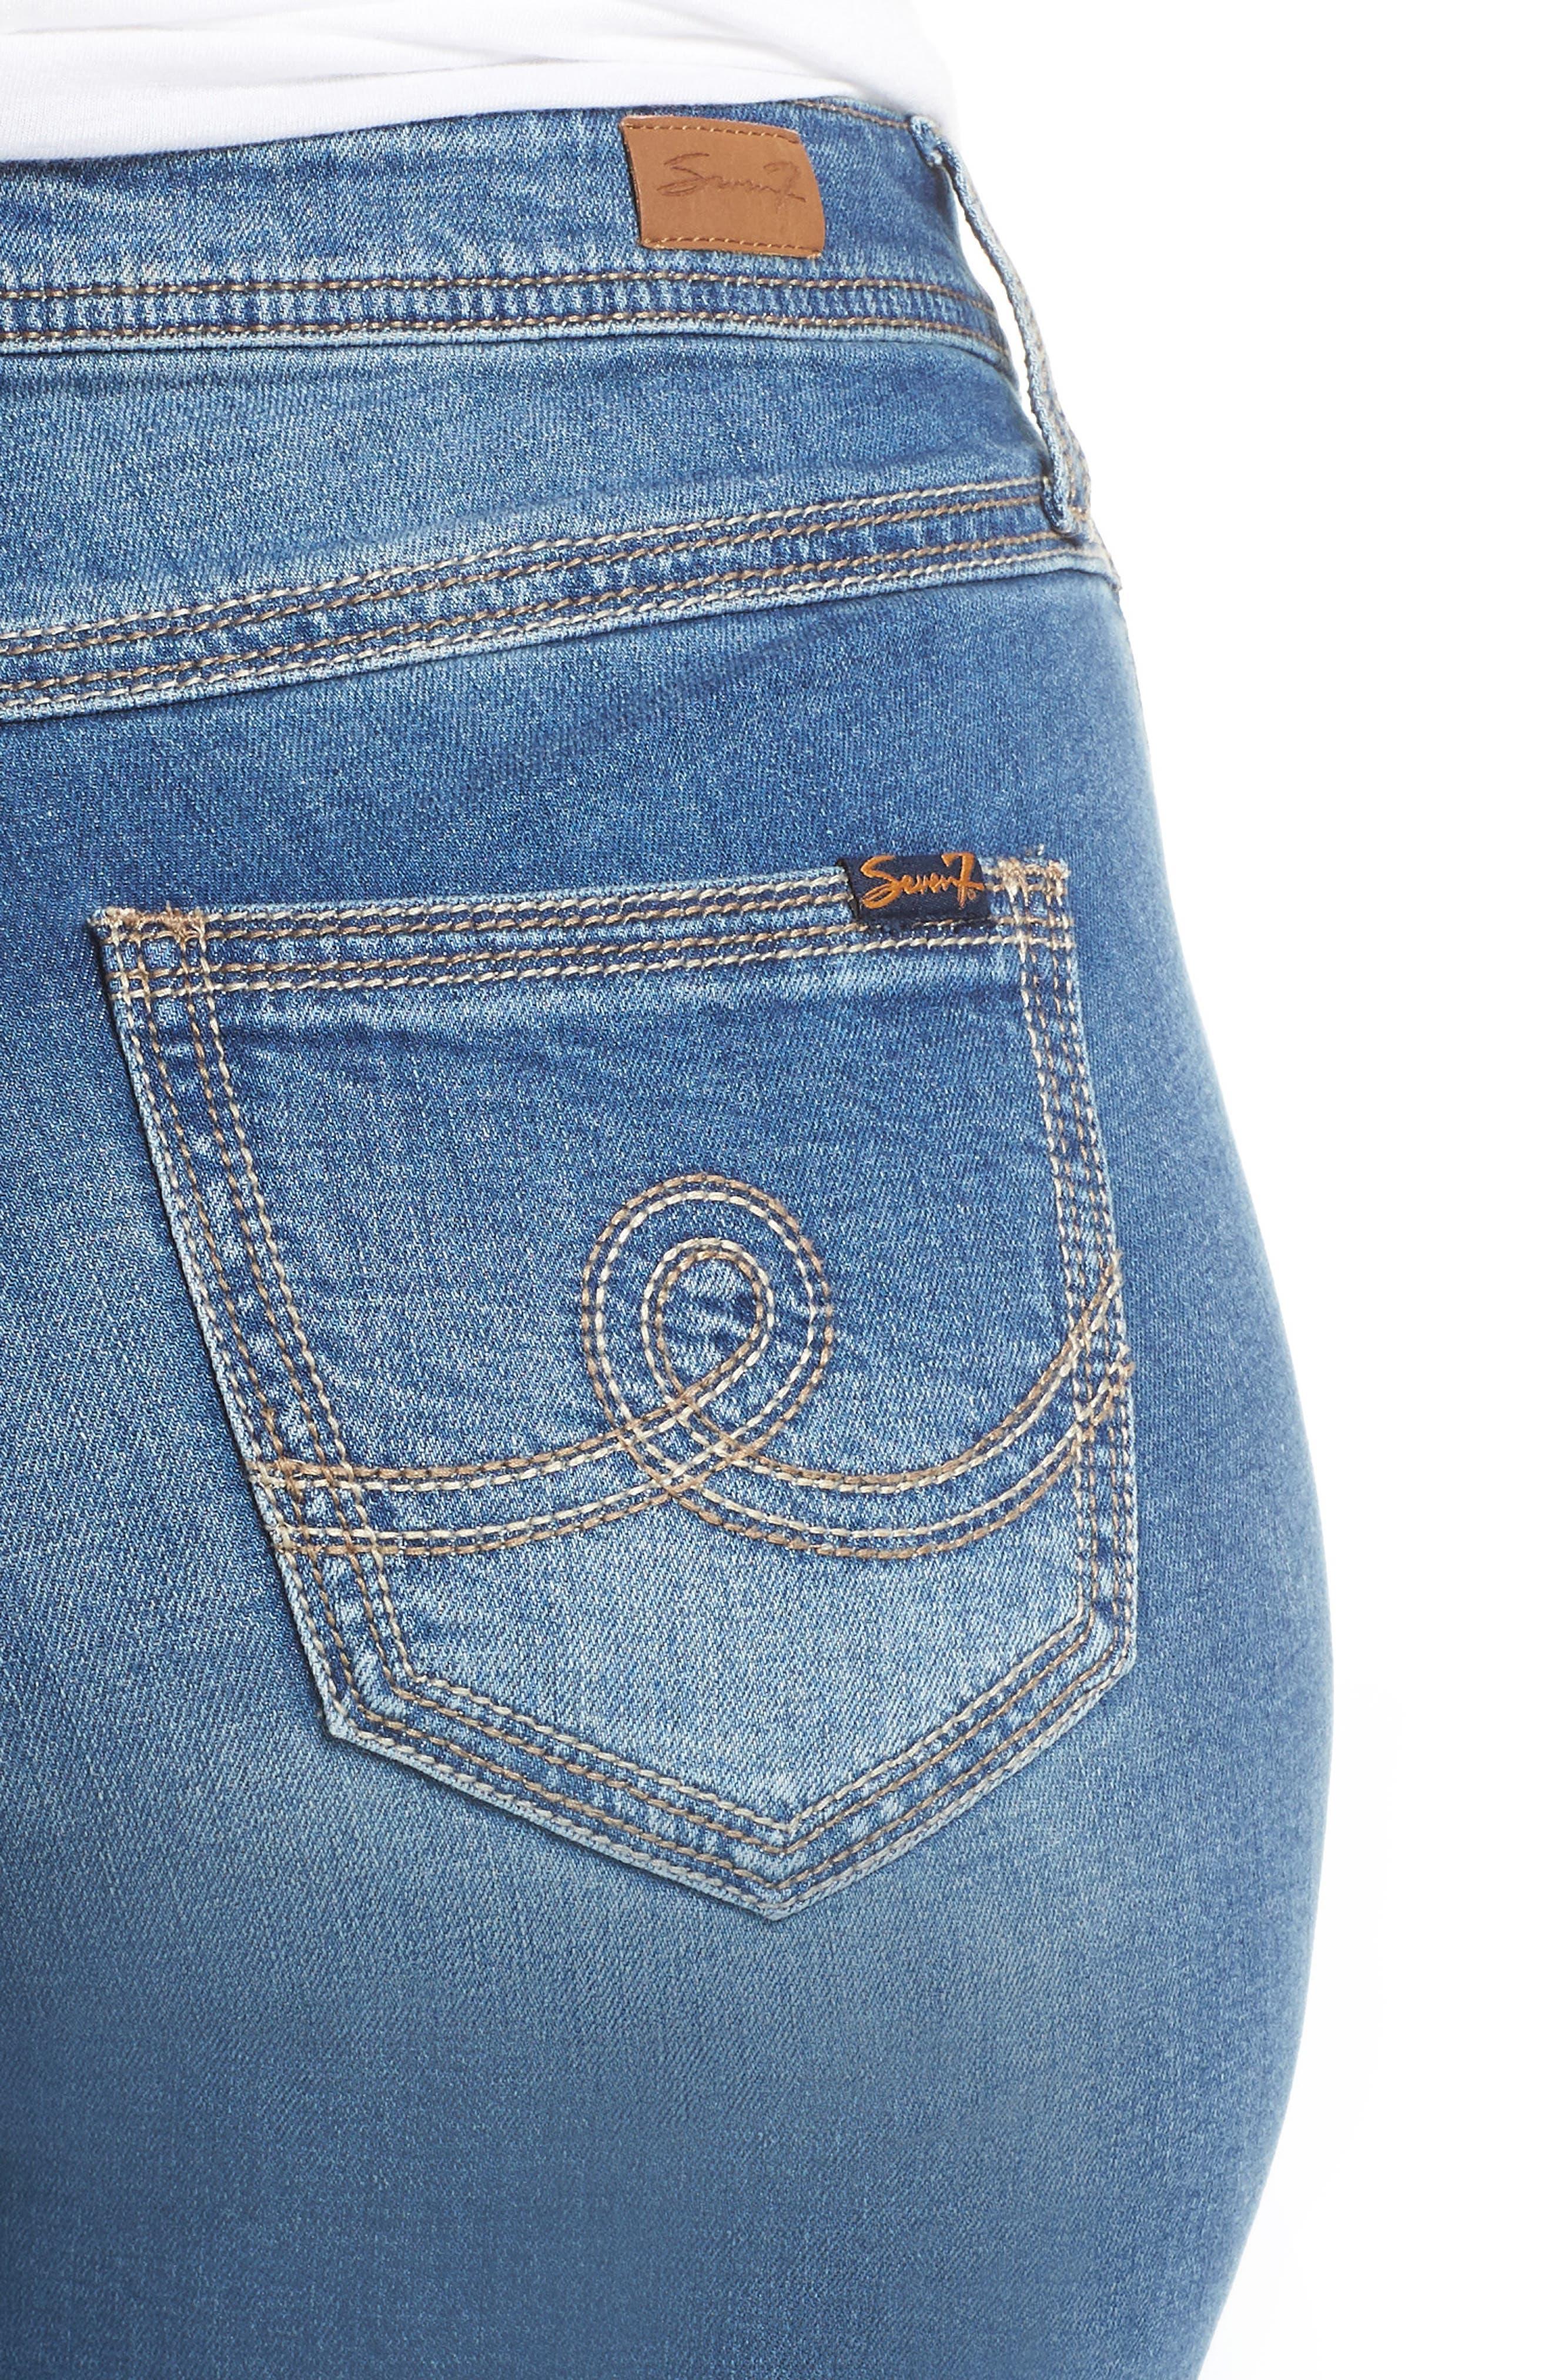 Rocker Skinny Jeans,                             Alternate thumbnail 4, color,                             LADYBIRD